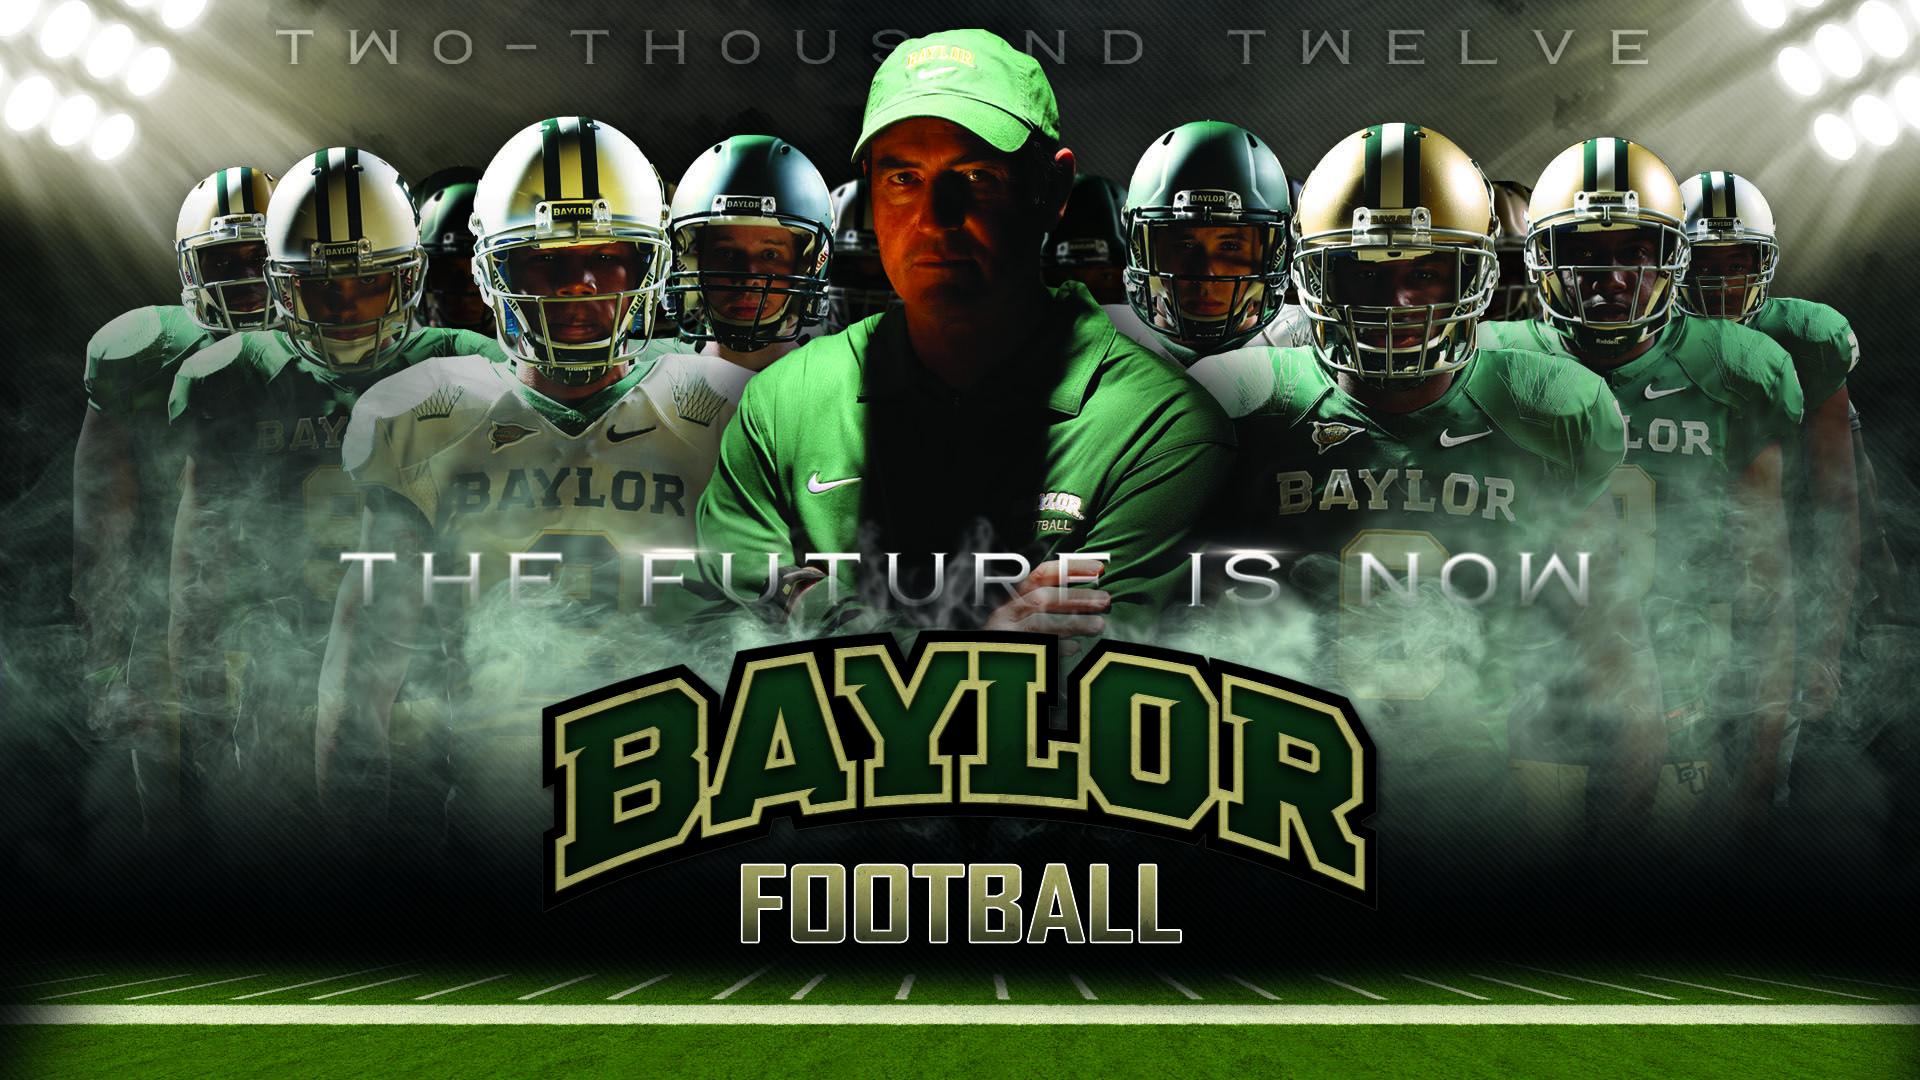 Baylor Football Logo 7038634 Baylor Football Football Wallpaper Baylor